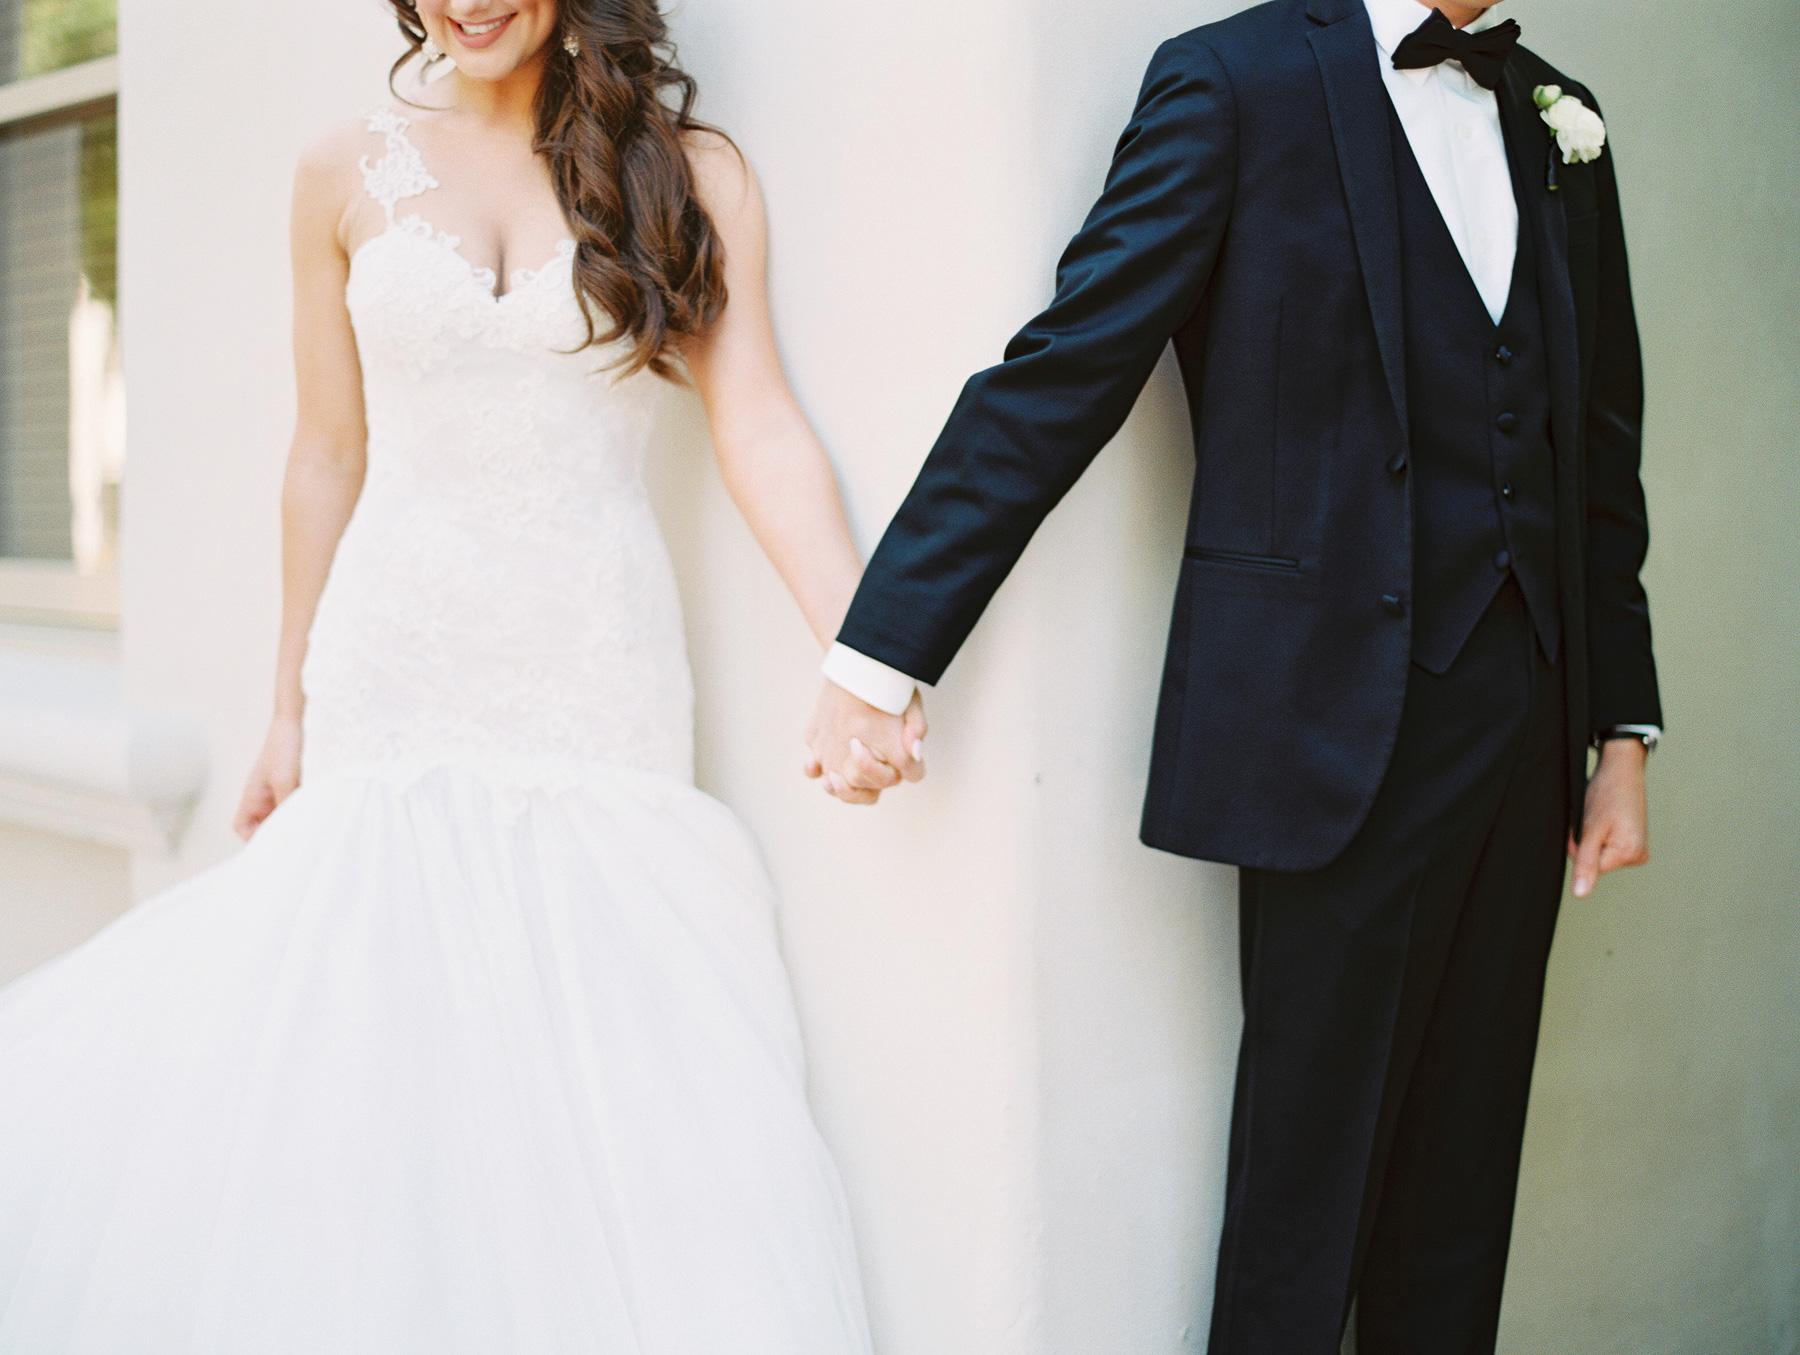 Pelican-hill-wedding-01.JPG